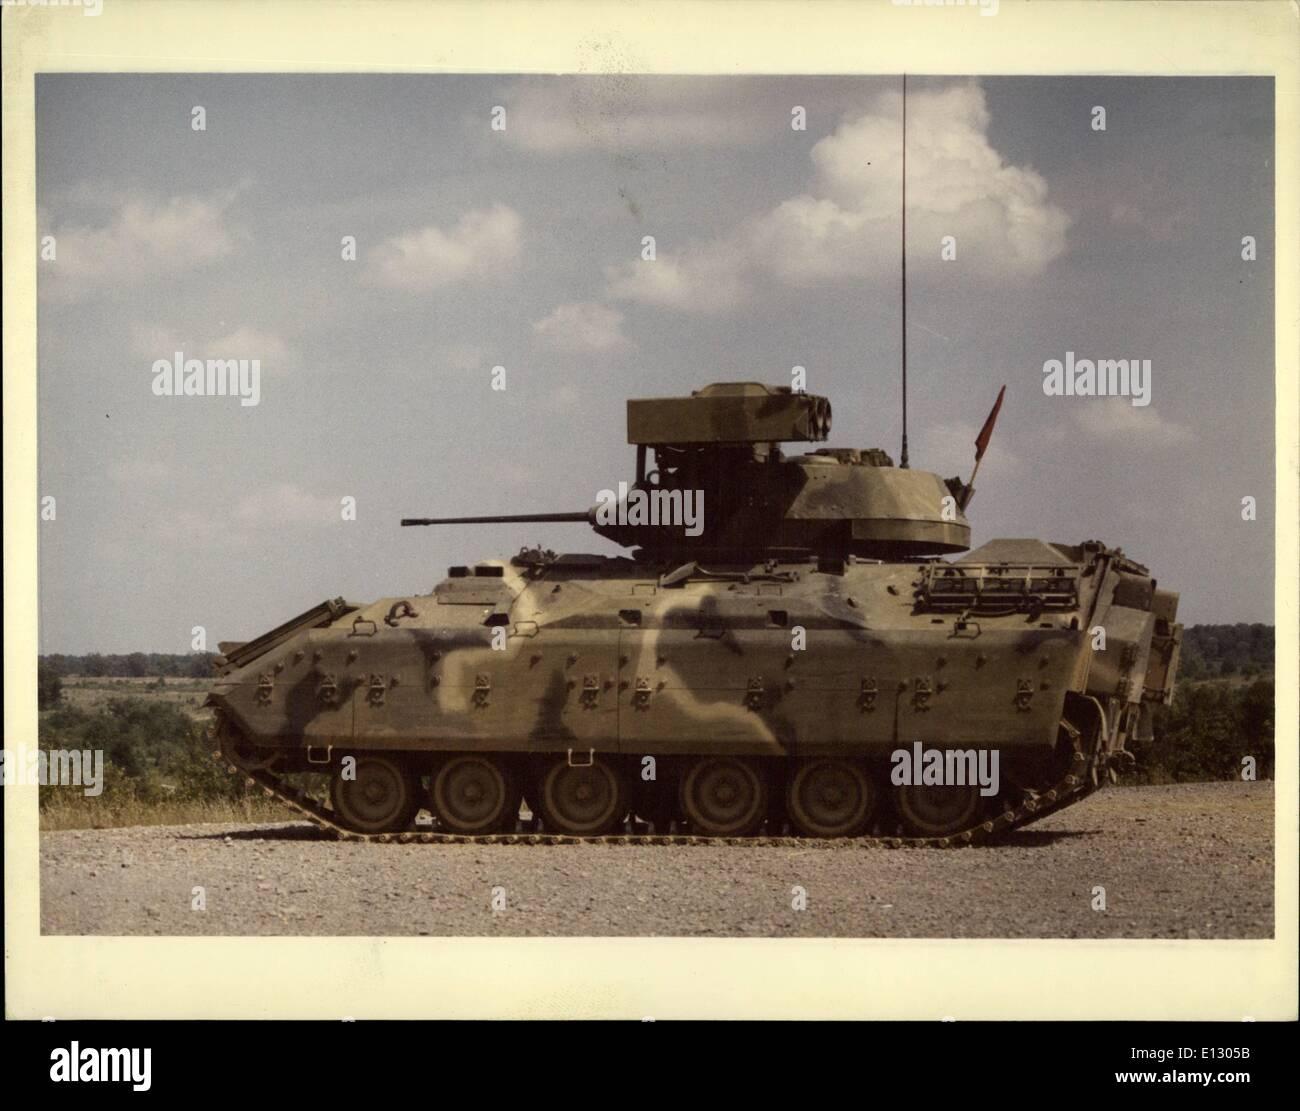 Feb. 26, 2012 - XM -2 Tank - Stock Image